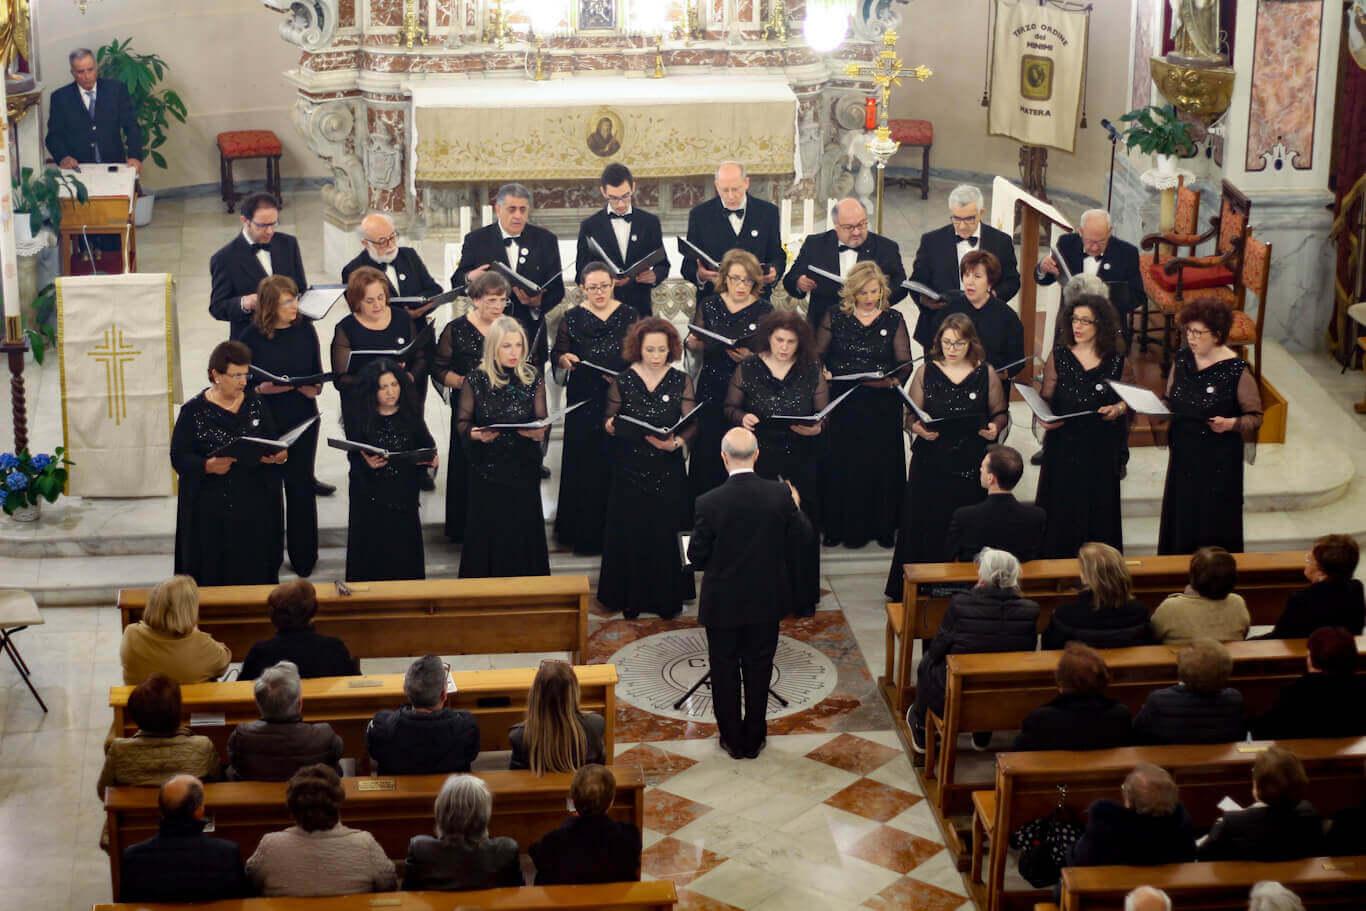 La Musica Sacra nei Luoghi Sacri